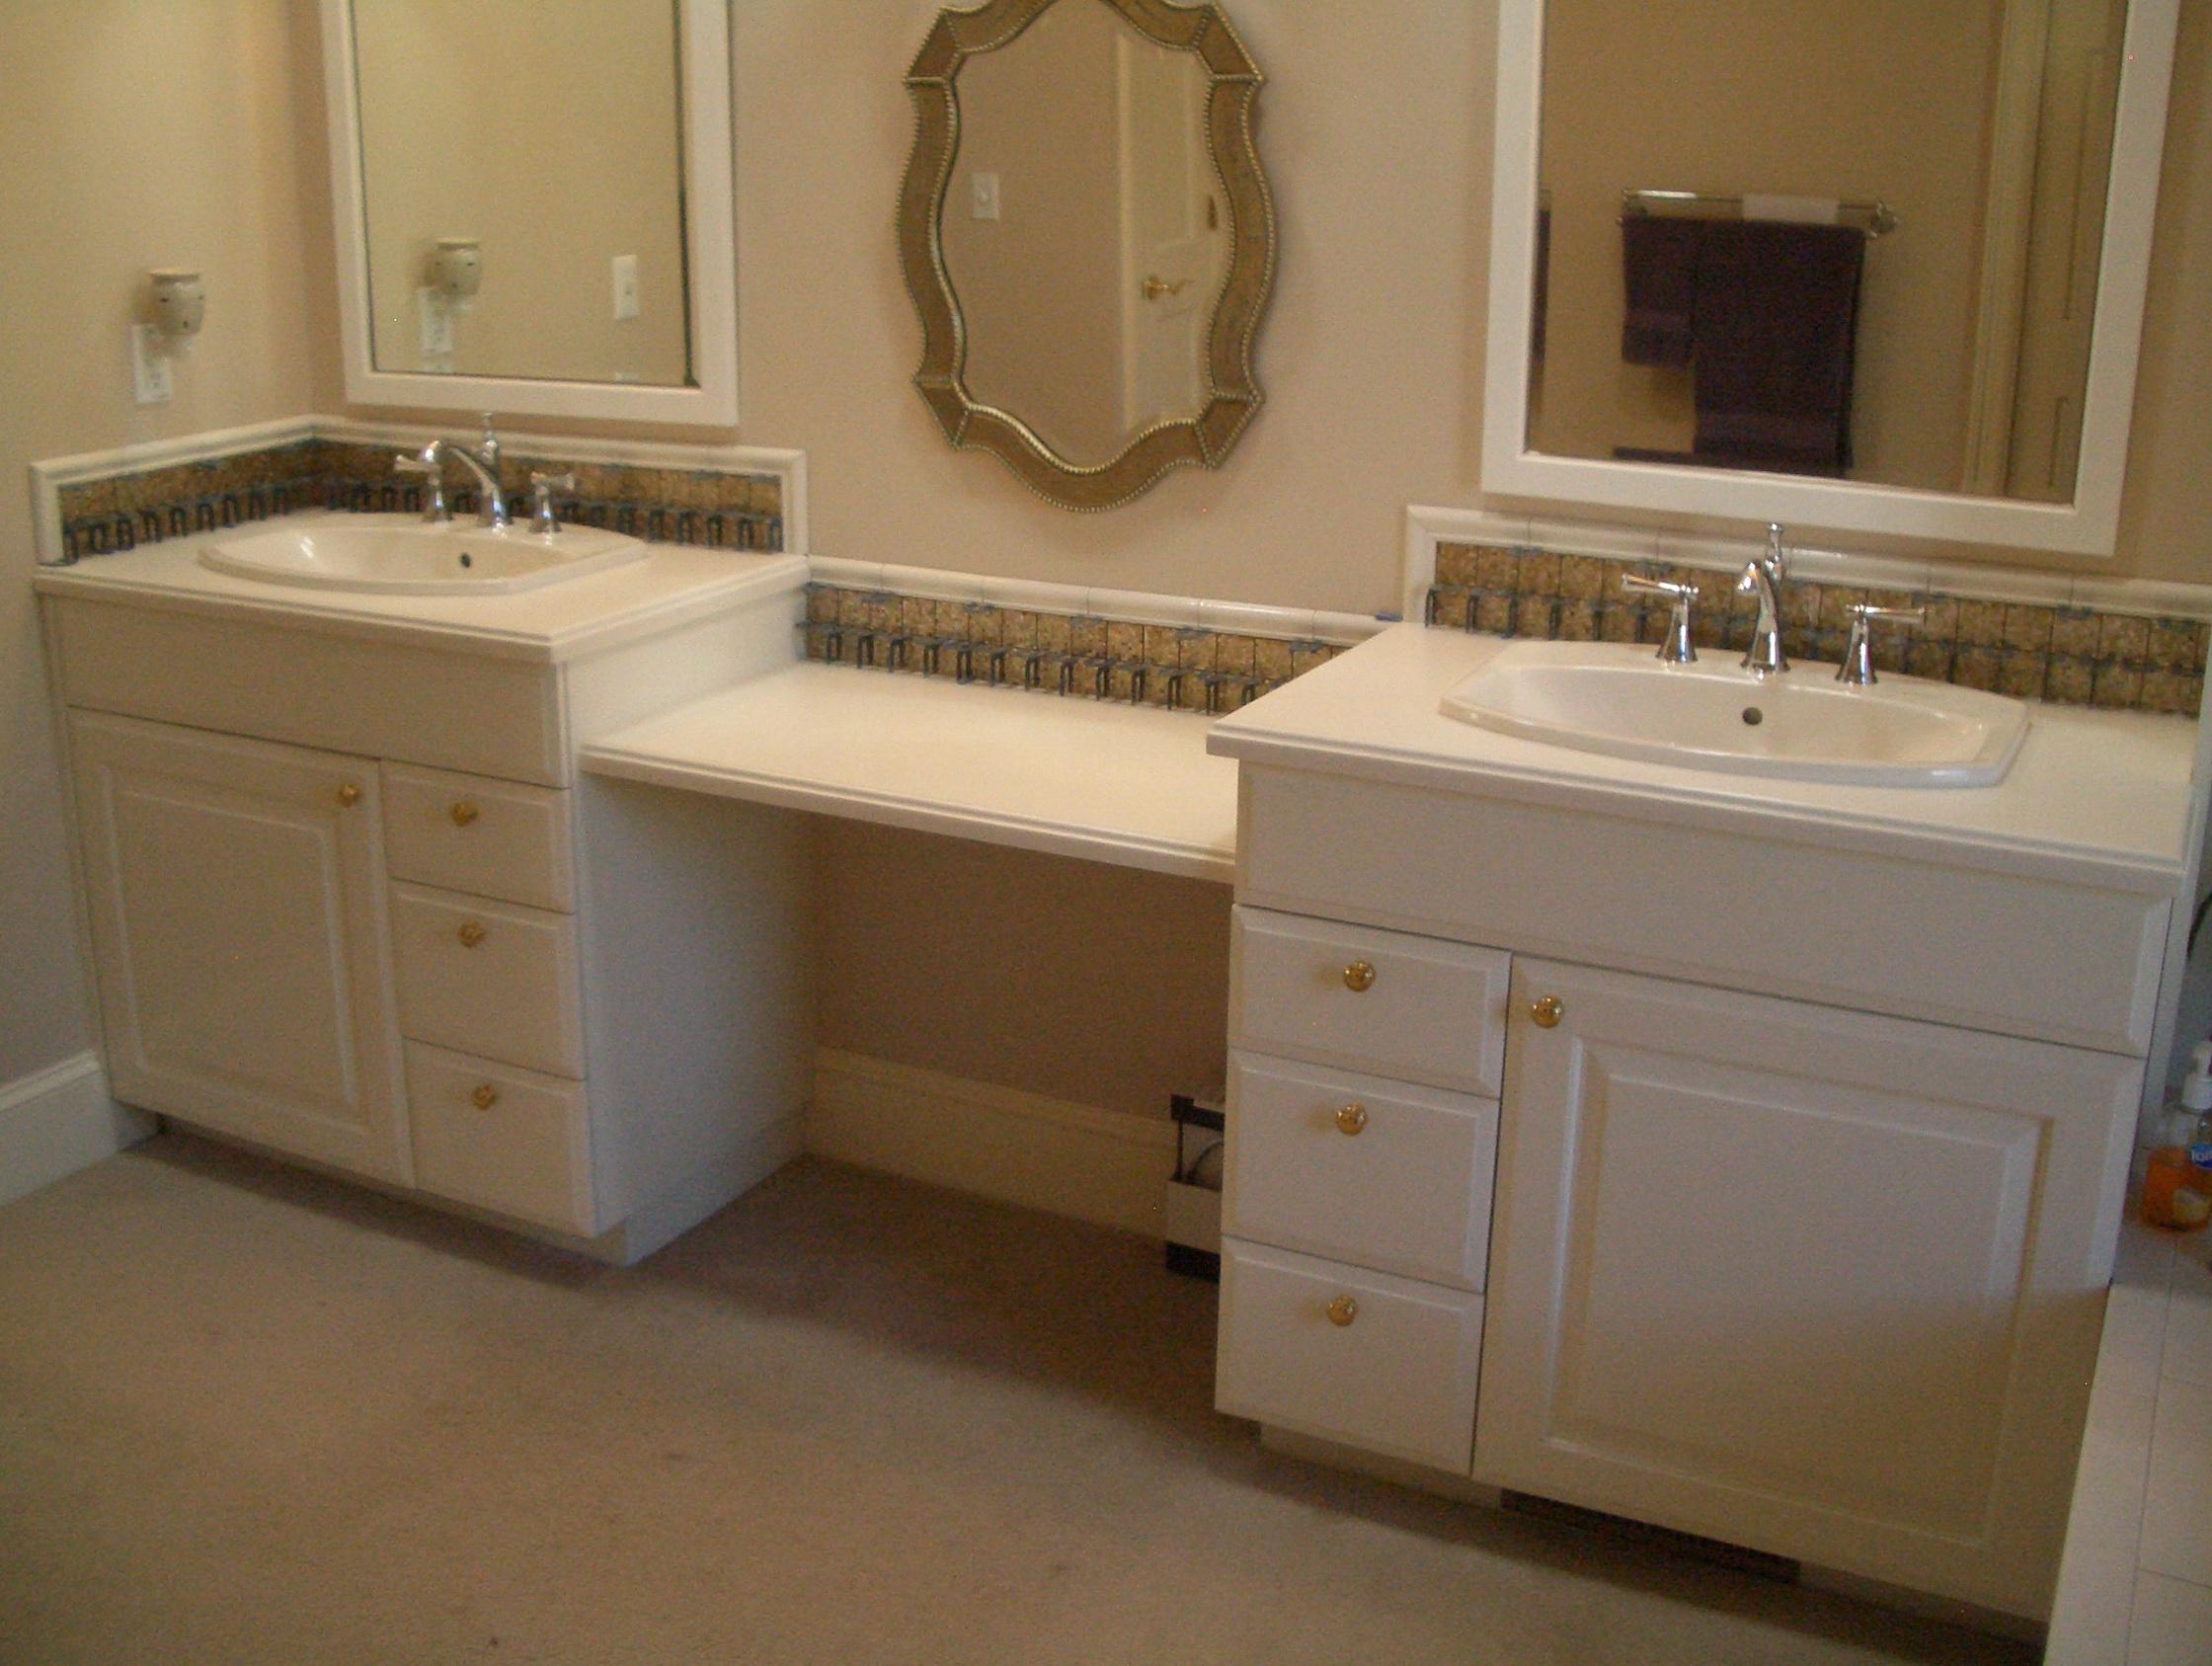 How To Install A Bathroom Vanity Backsplash Home Design Ideas